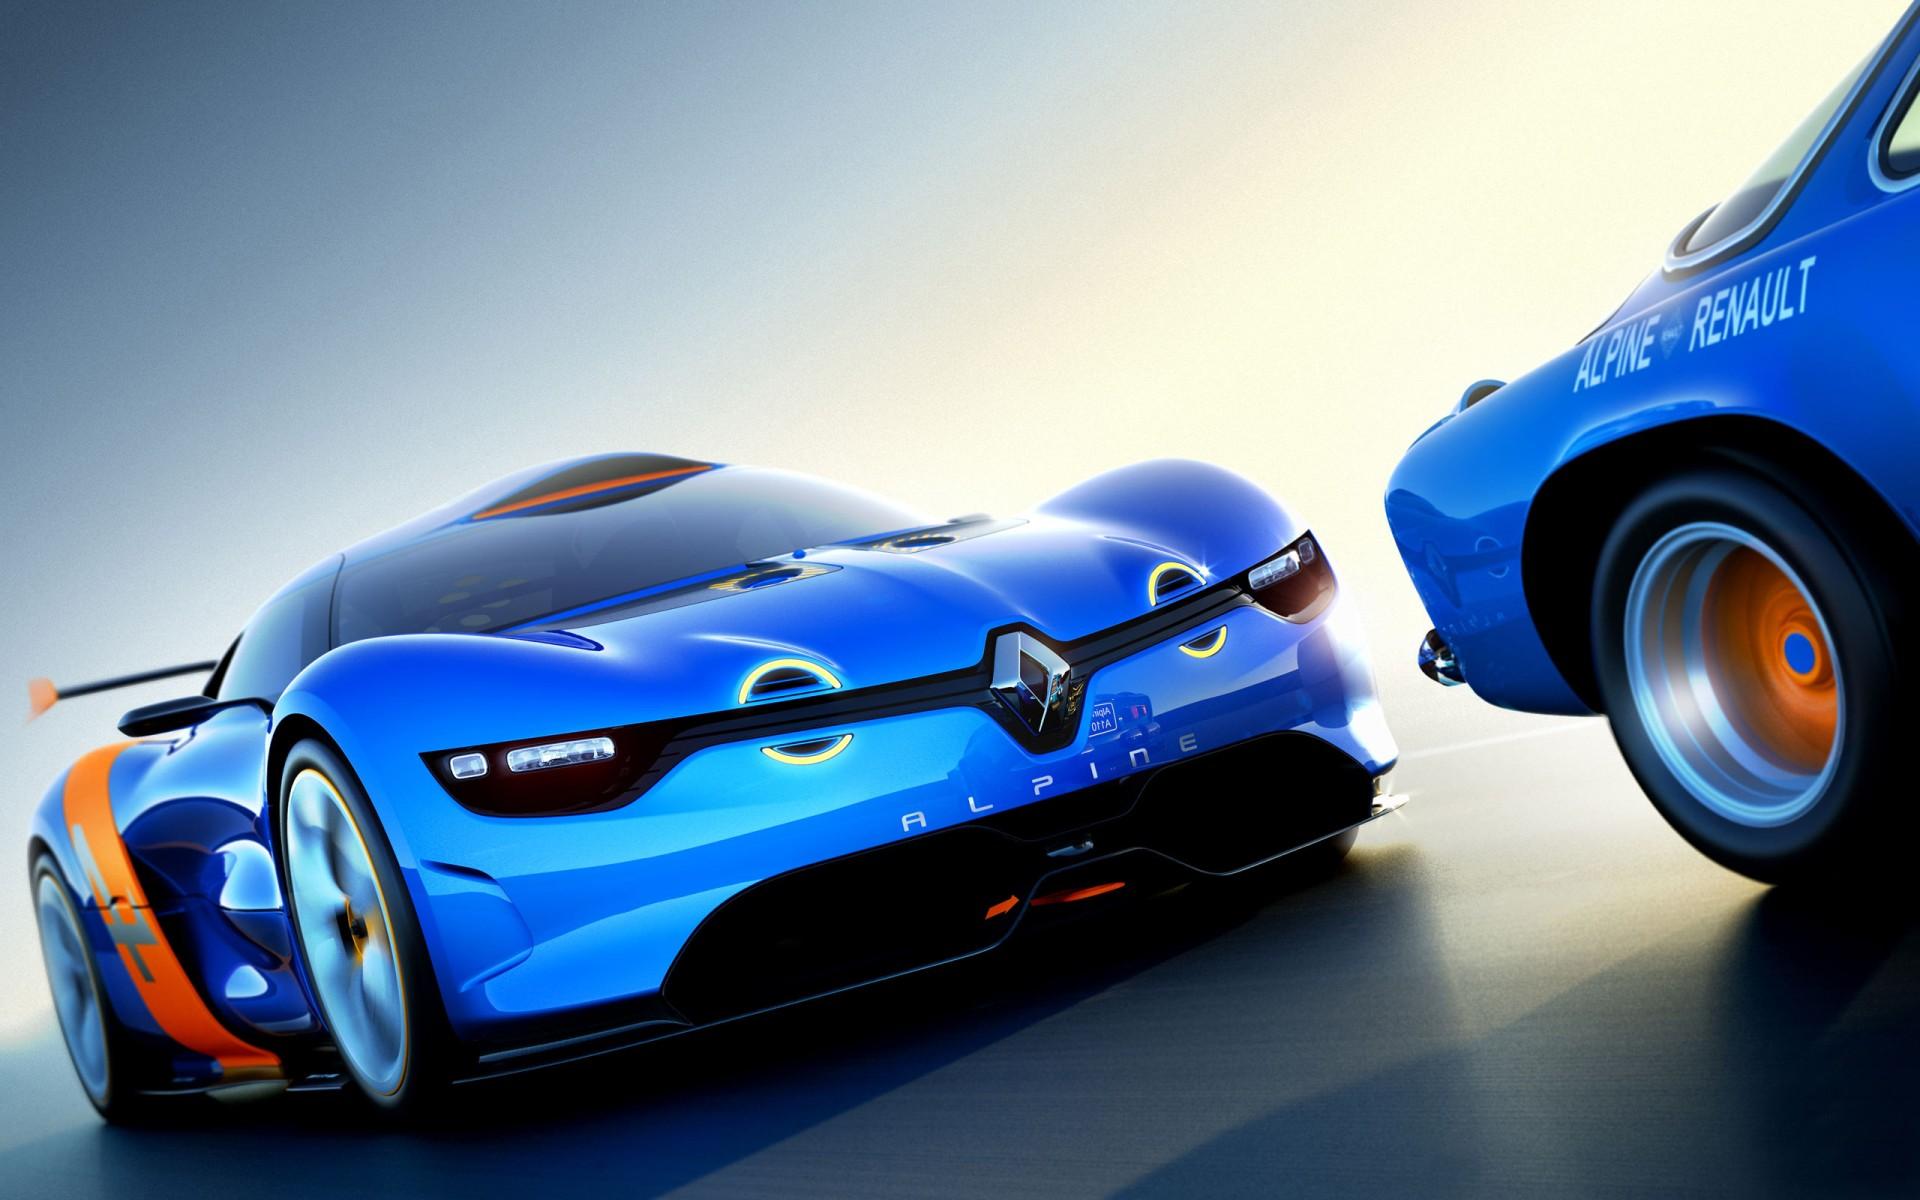 Bmw Sports Cars Wallpapers Desktop Backgrounds Renault Alpine A110 50 Concept 5 Wallpaper Hd Car